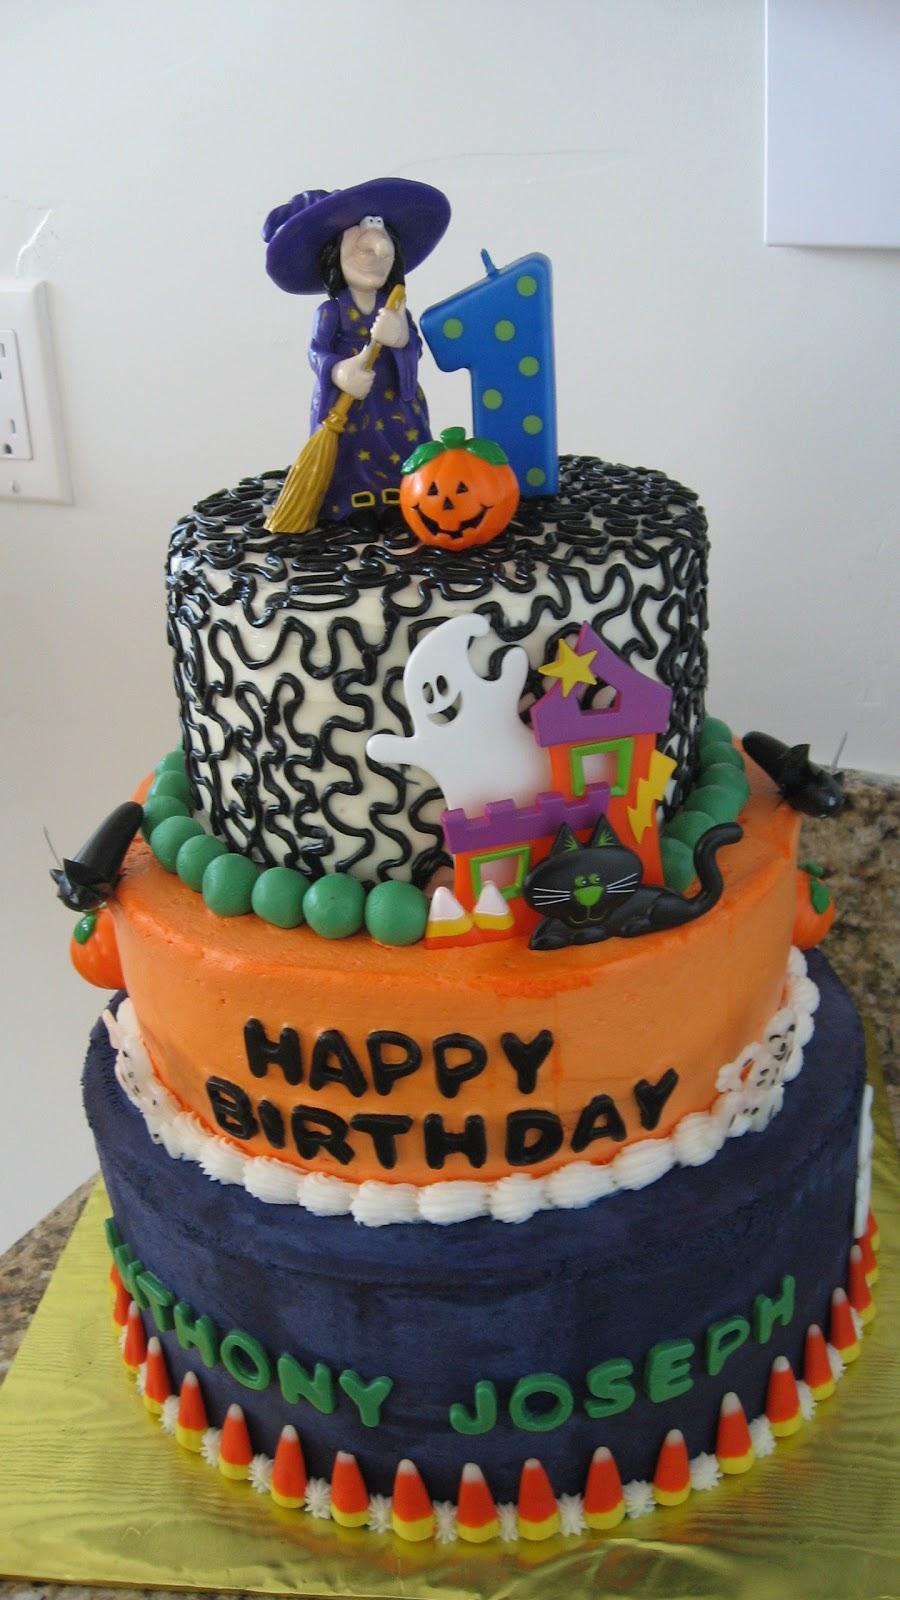 Birthday Cake Center: Halloween Birthday Cakes 2011 ...